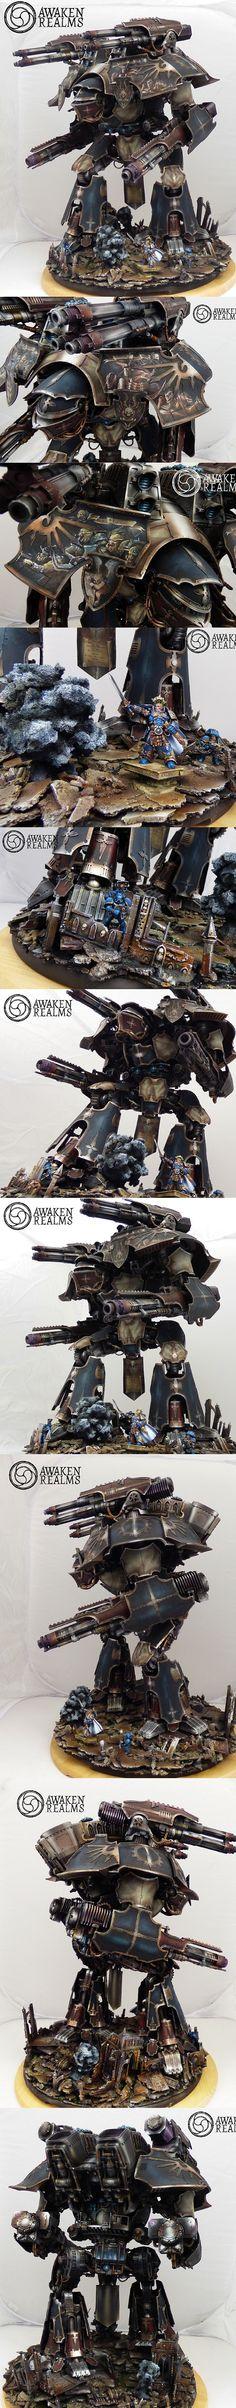 40k - Warlord Titan by Awaken Realms